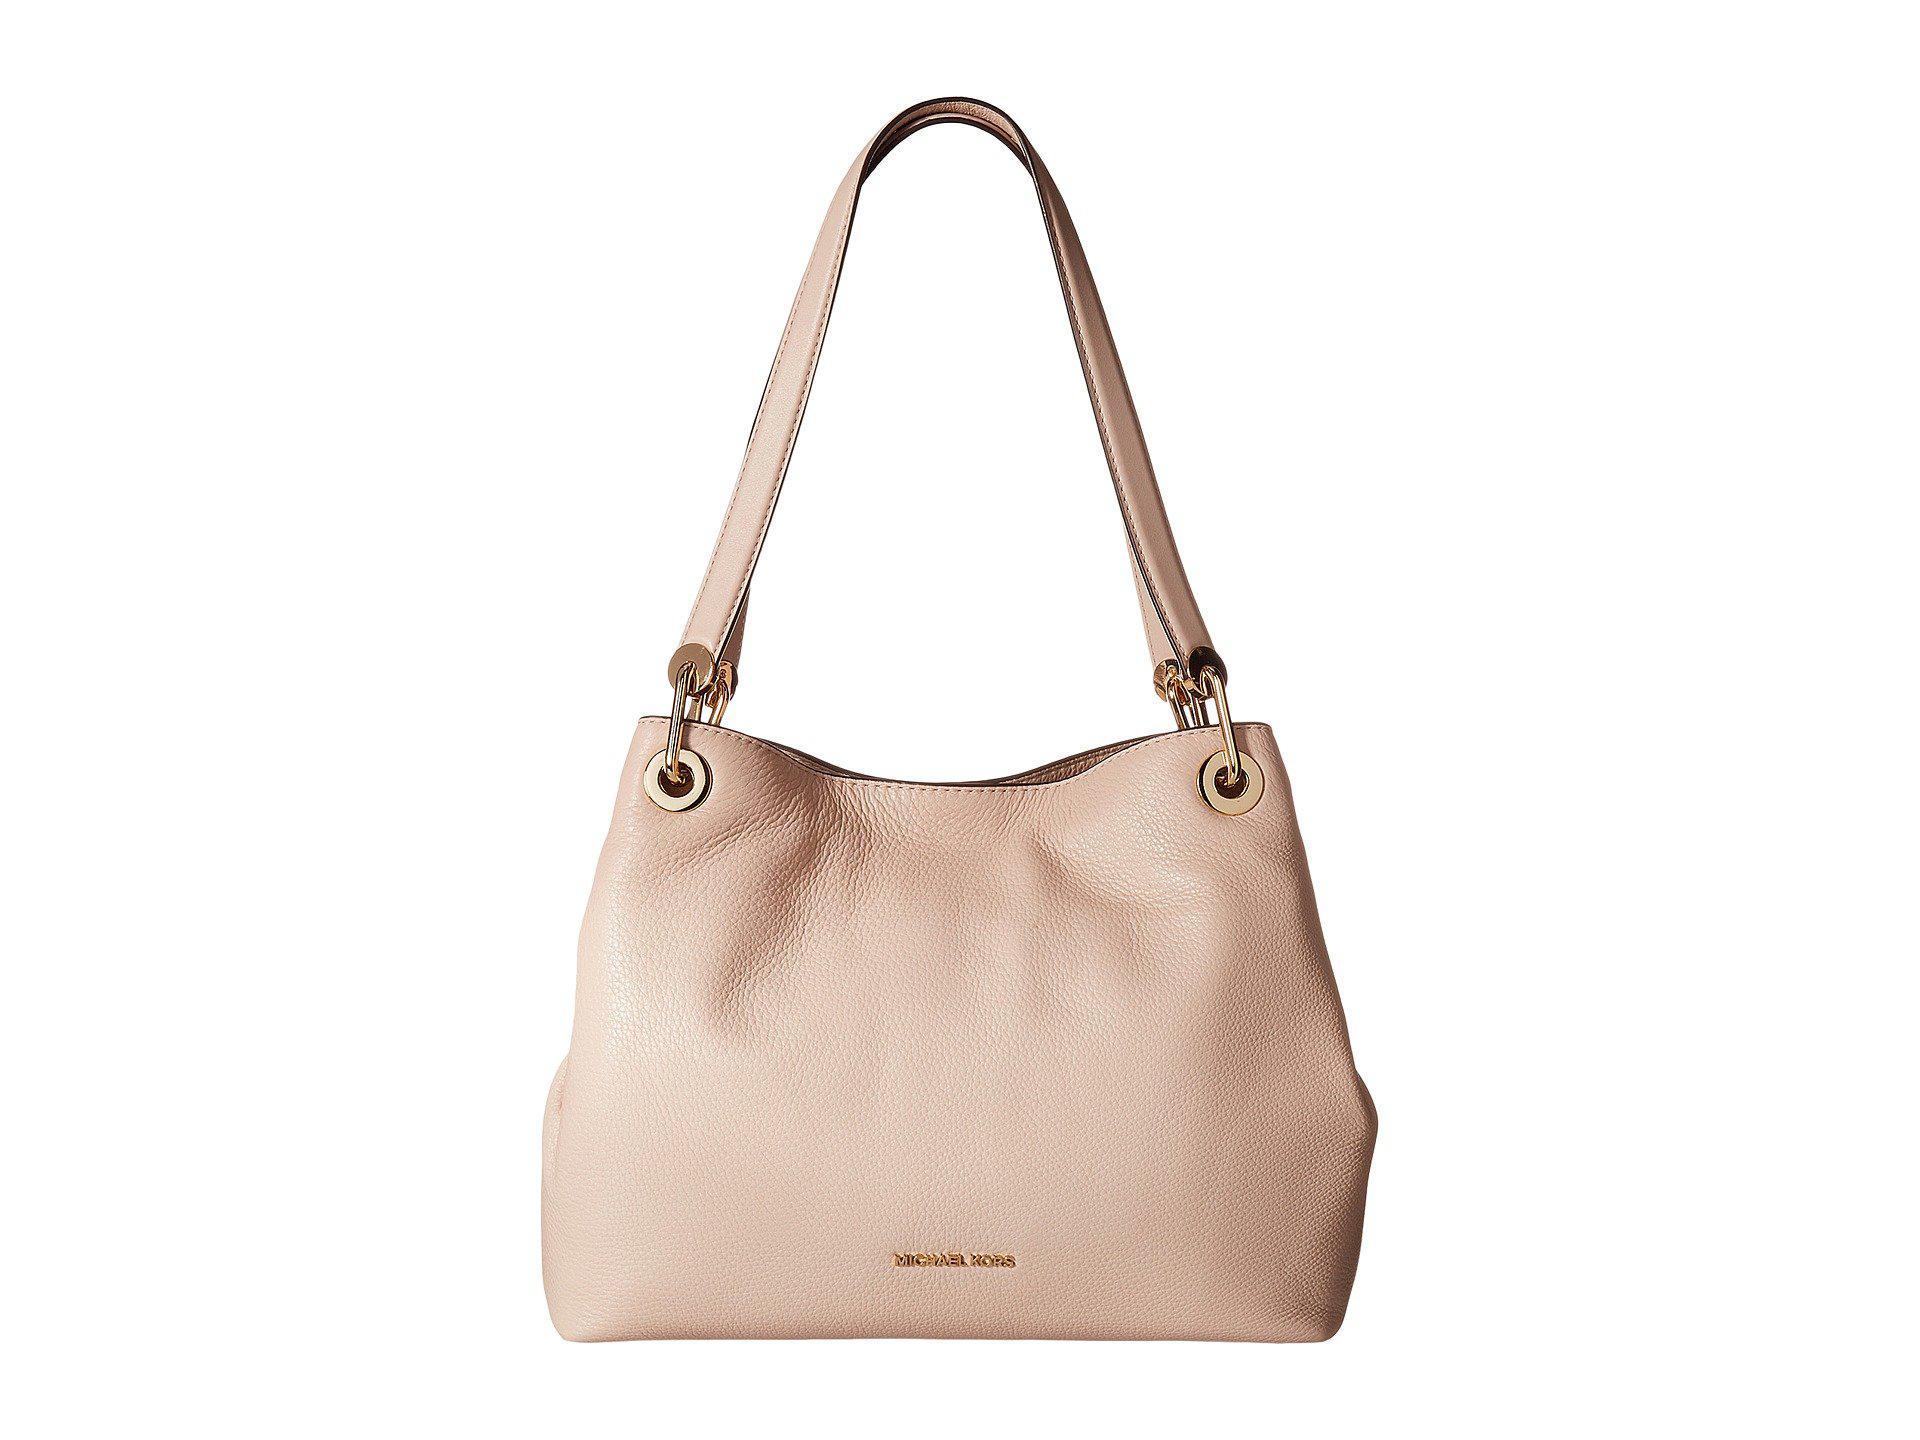 bb51635e41a7 MICHAEL Michael Kors. Women s Pink Raven Large Shoulder Tote (mushroom)  Tote Handbags